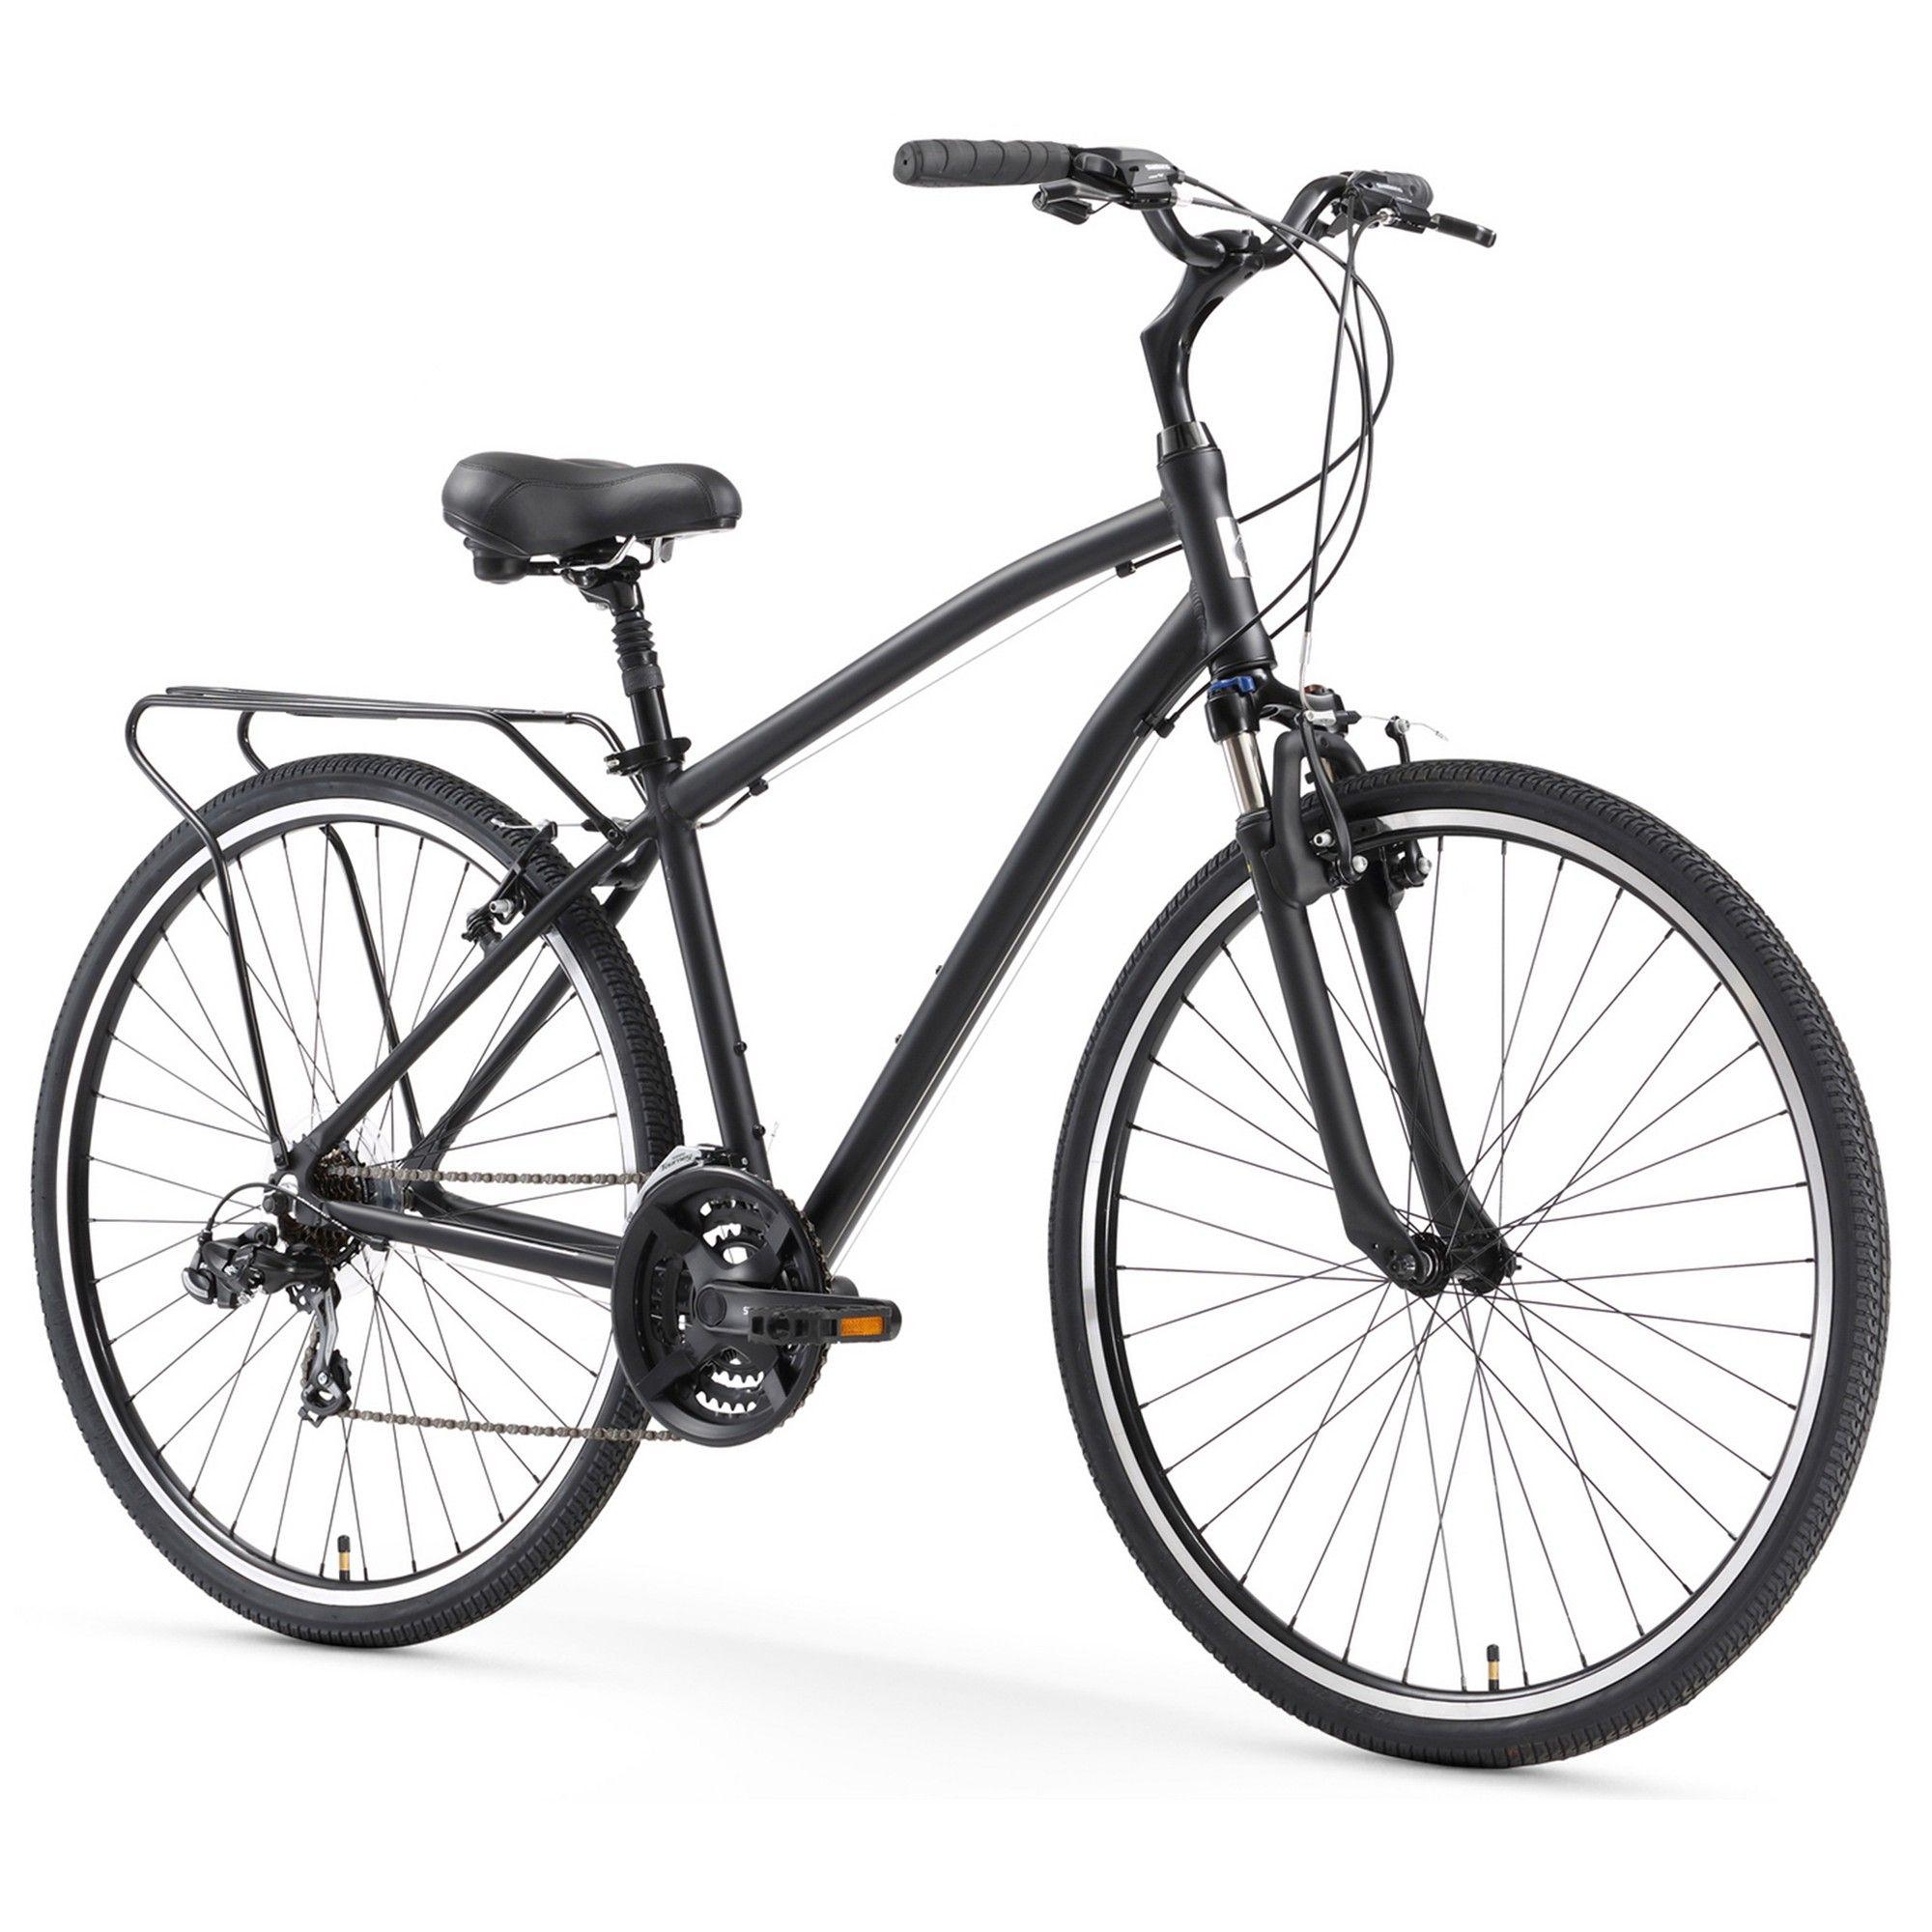 Sixthreezero Body Ease Men S 21sp Comfort 26 Hybrid Bike Matte